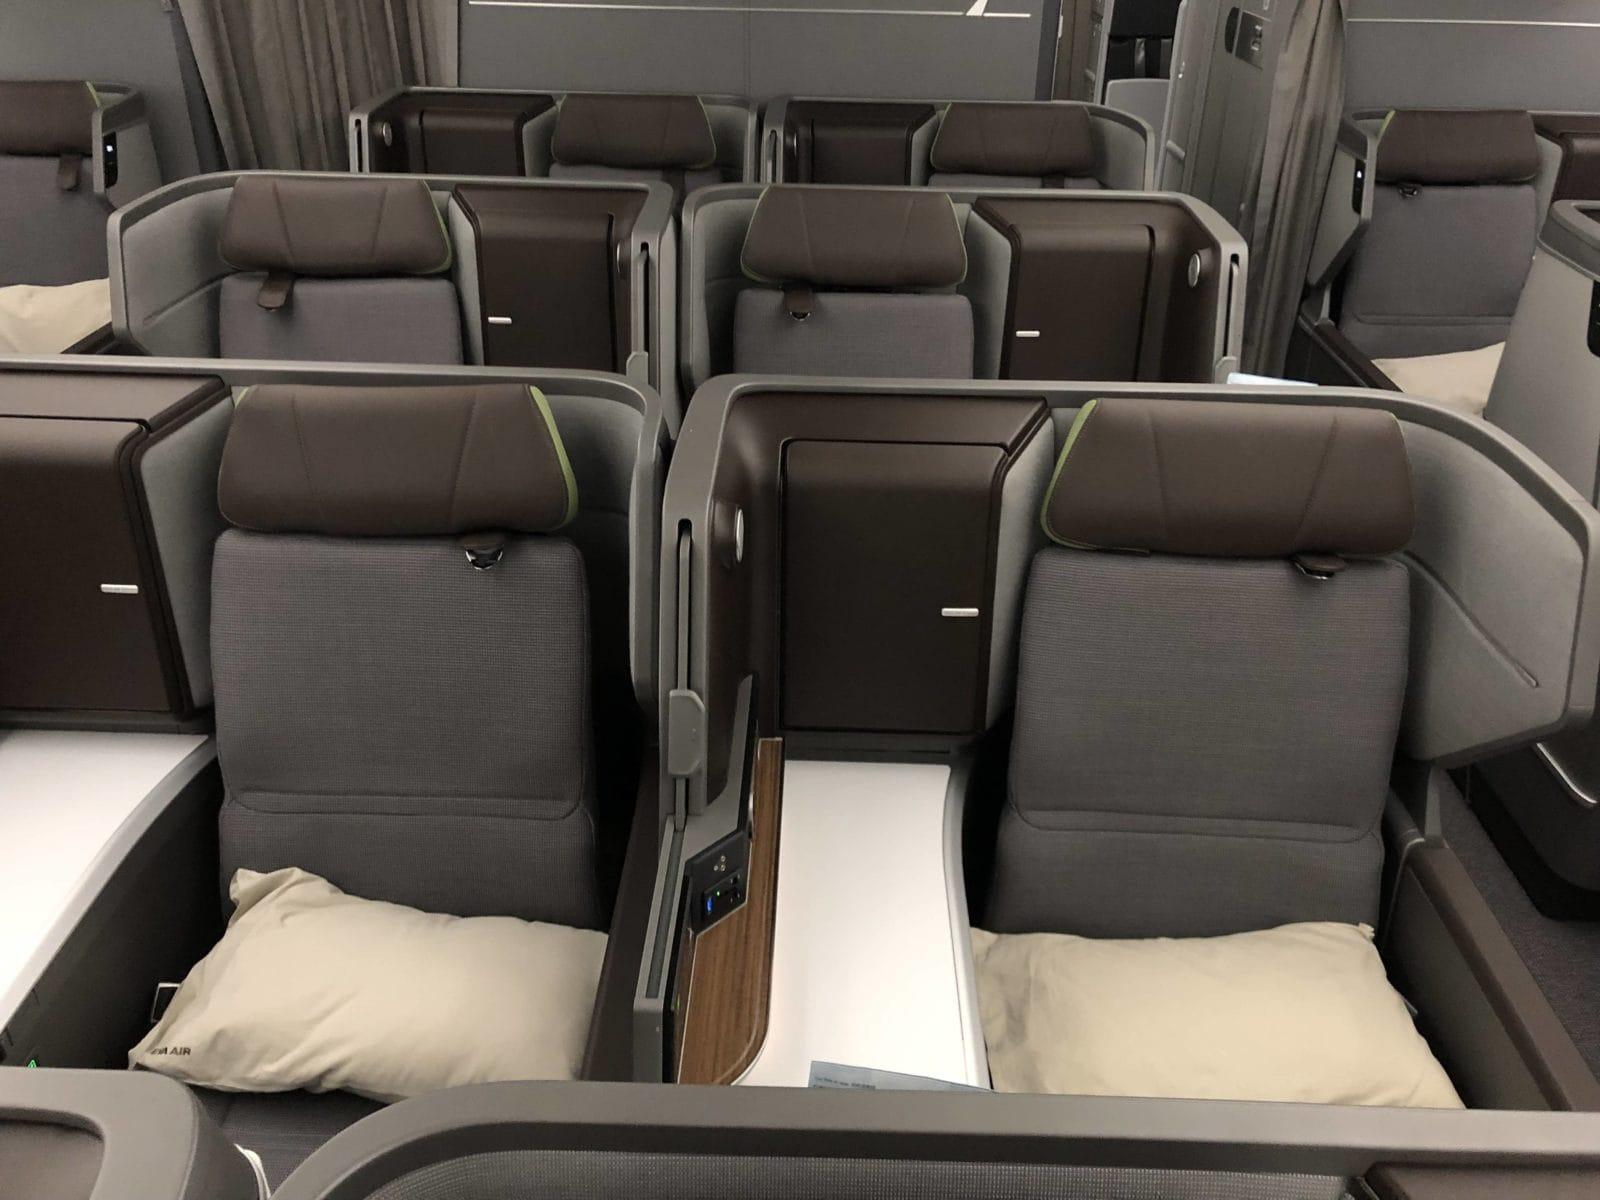 EVA Air neue Business Class 787-9 Sitzreihen hinten